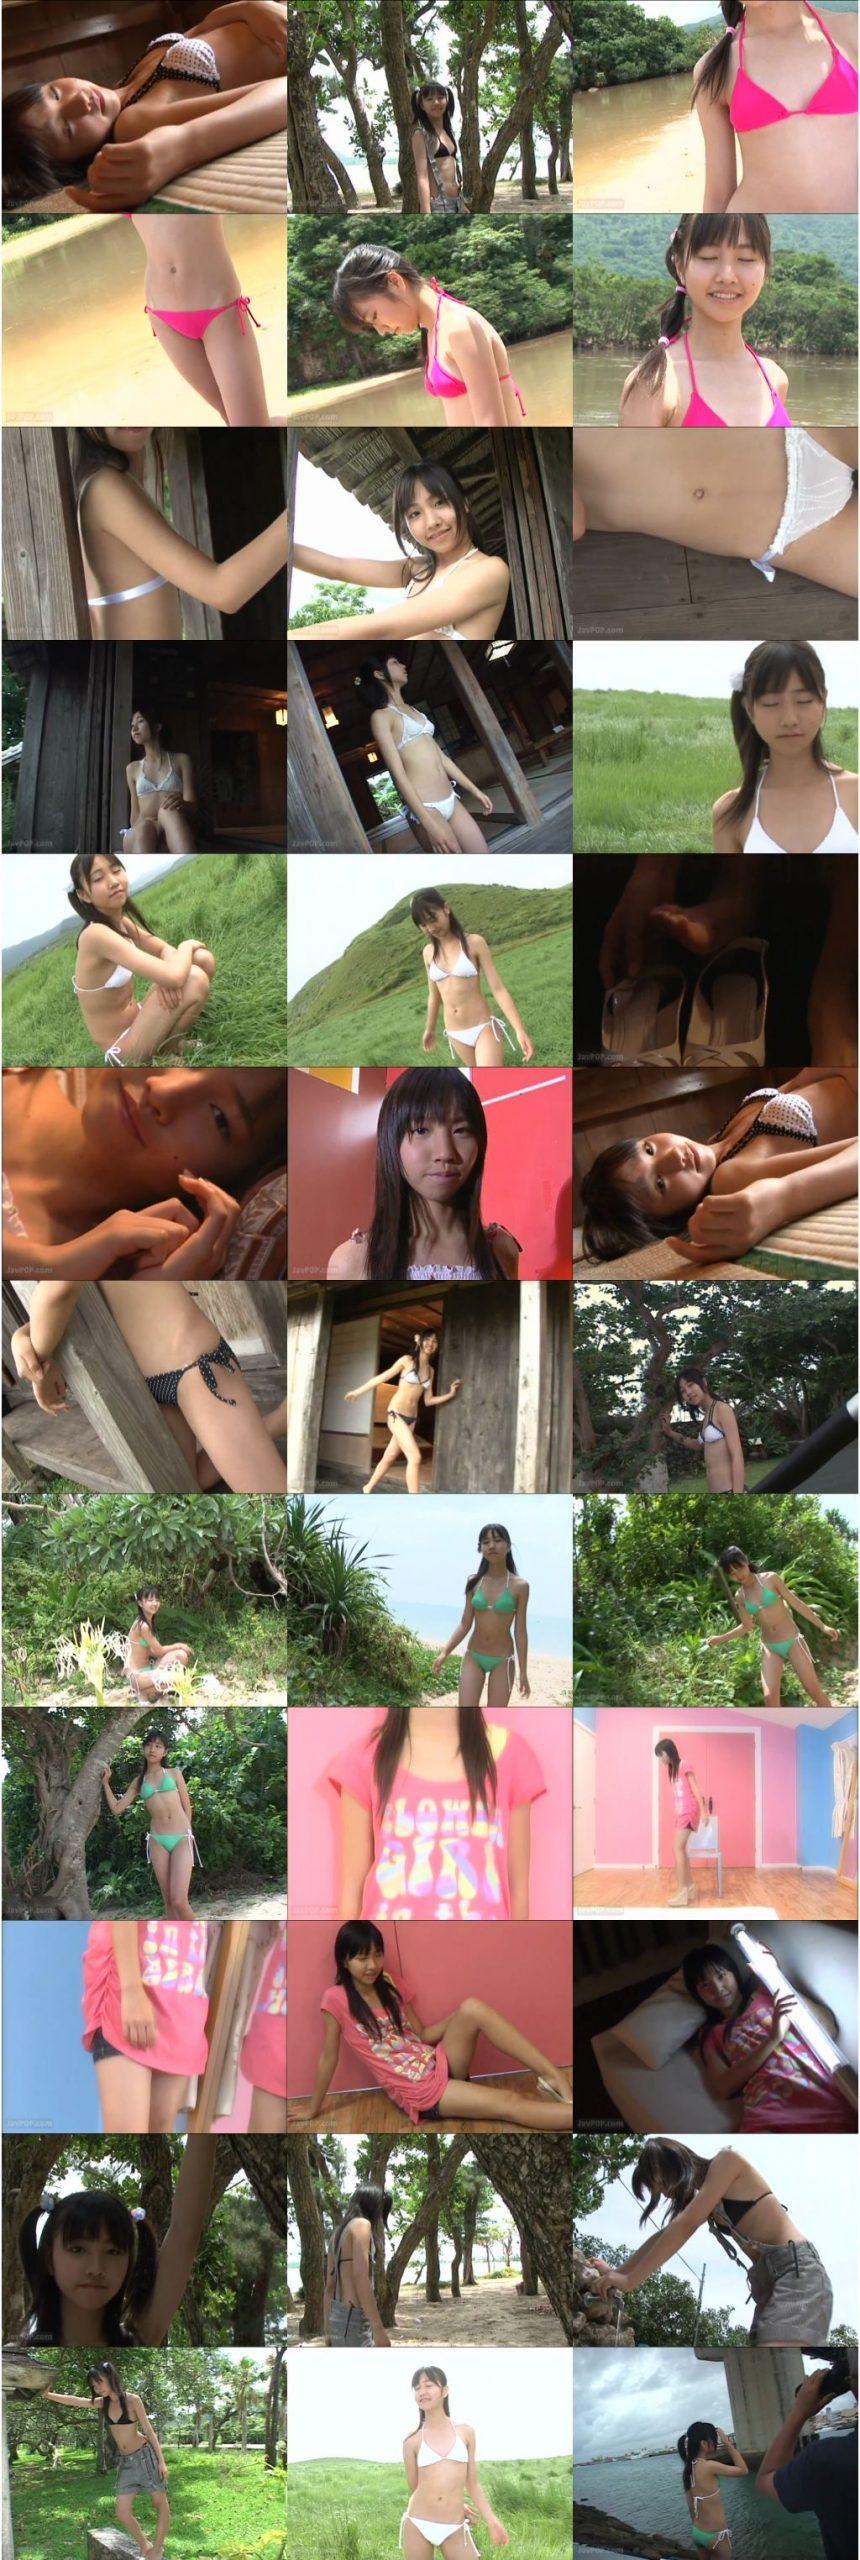 cpsky 074 miku takaoka s scaled - [CPSKY-074] 高岡未来 Miku Takaoka